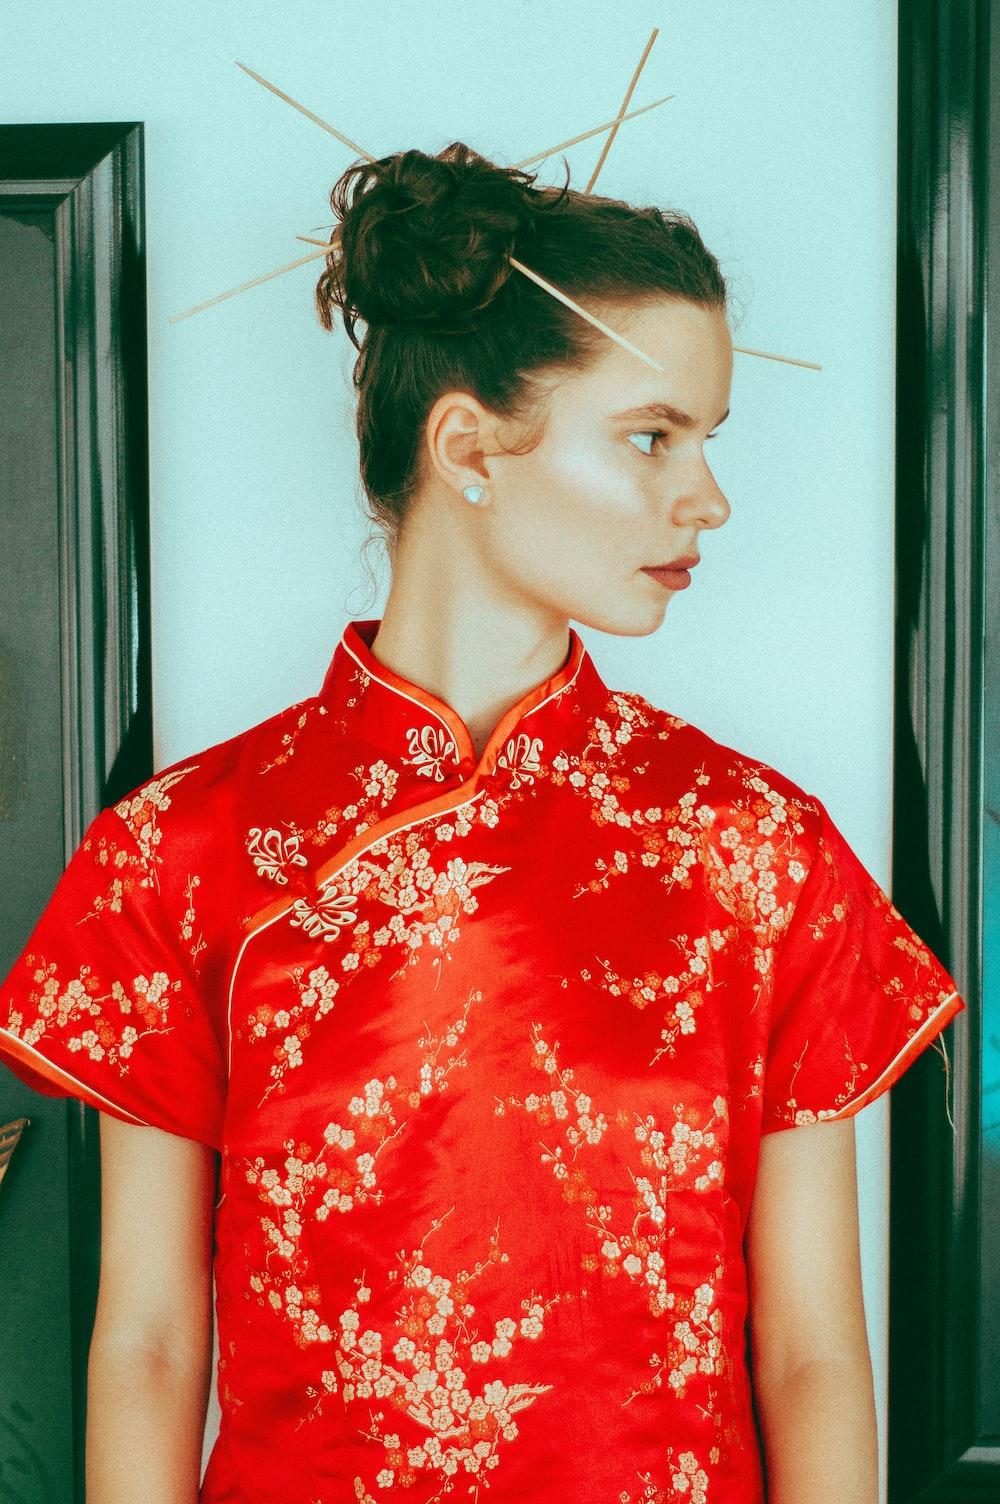 woman wearing red shirt